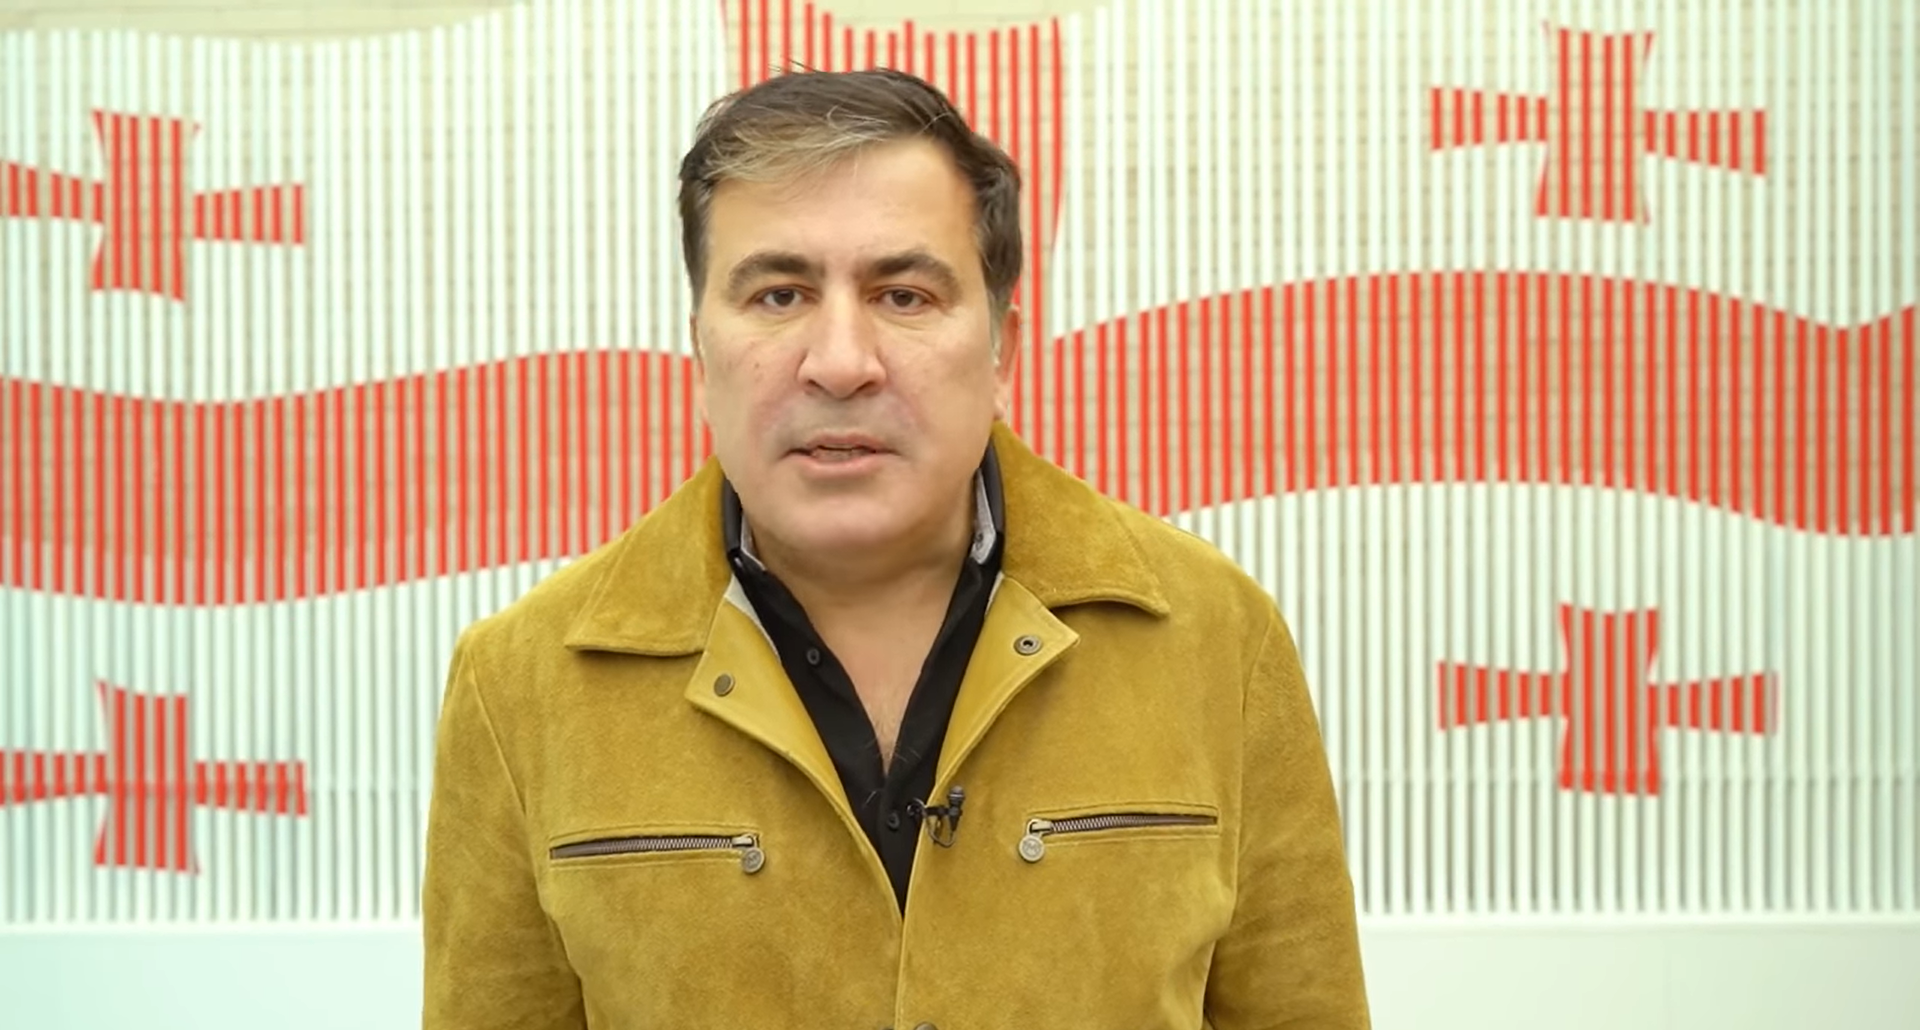 Mikheil Saakashvili 2587362 #новости возвращение Саакашвили, Михаил Саакашвили